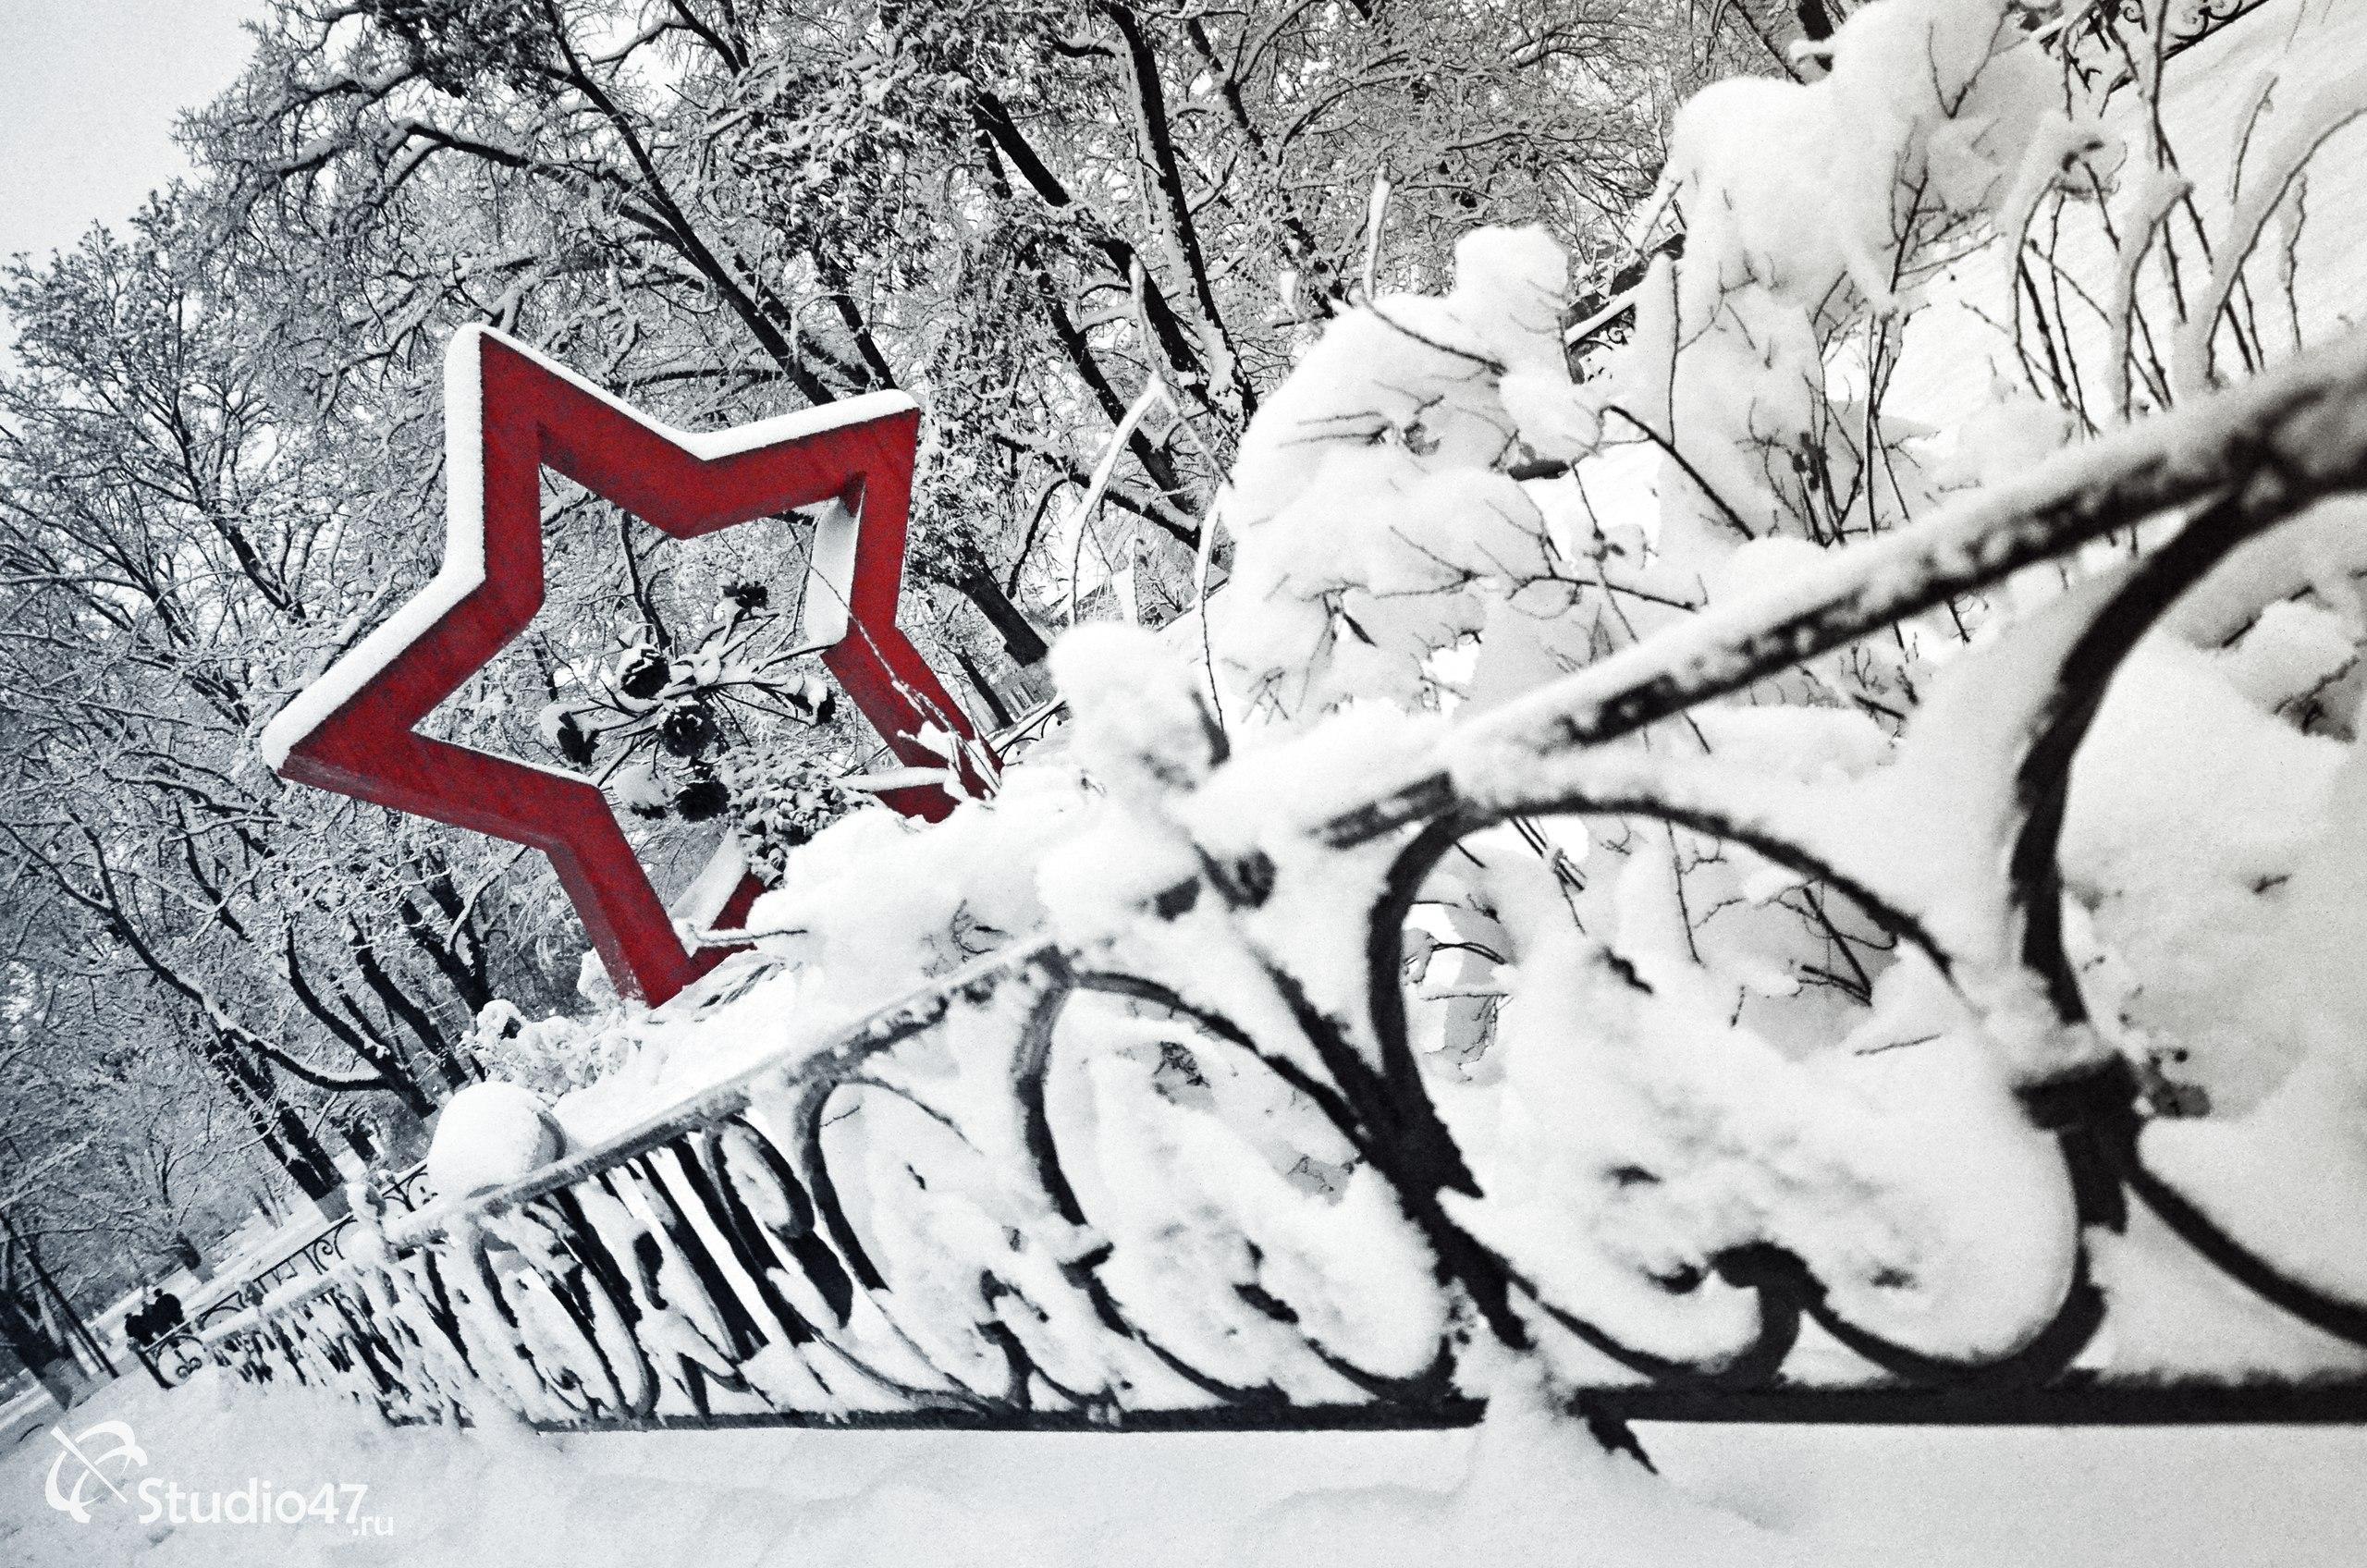 Памятник Звезда в Борисоглебске